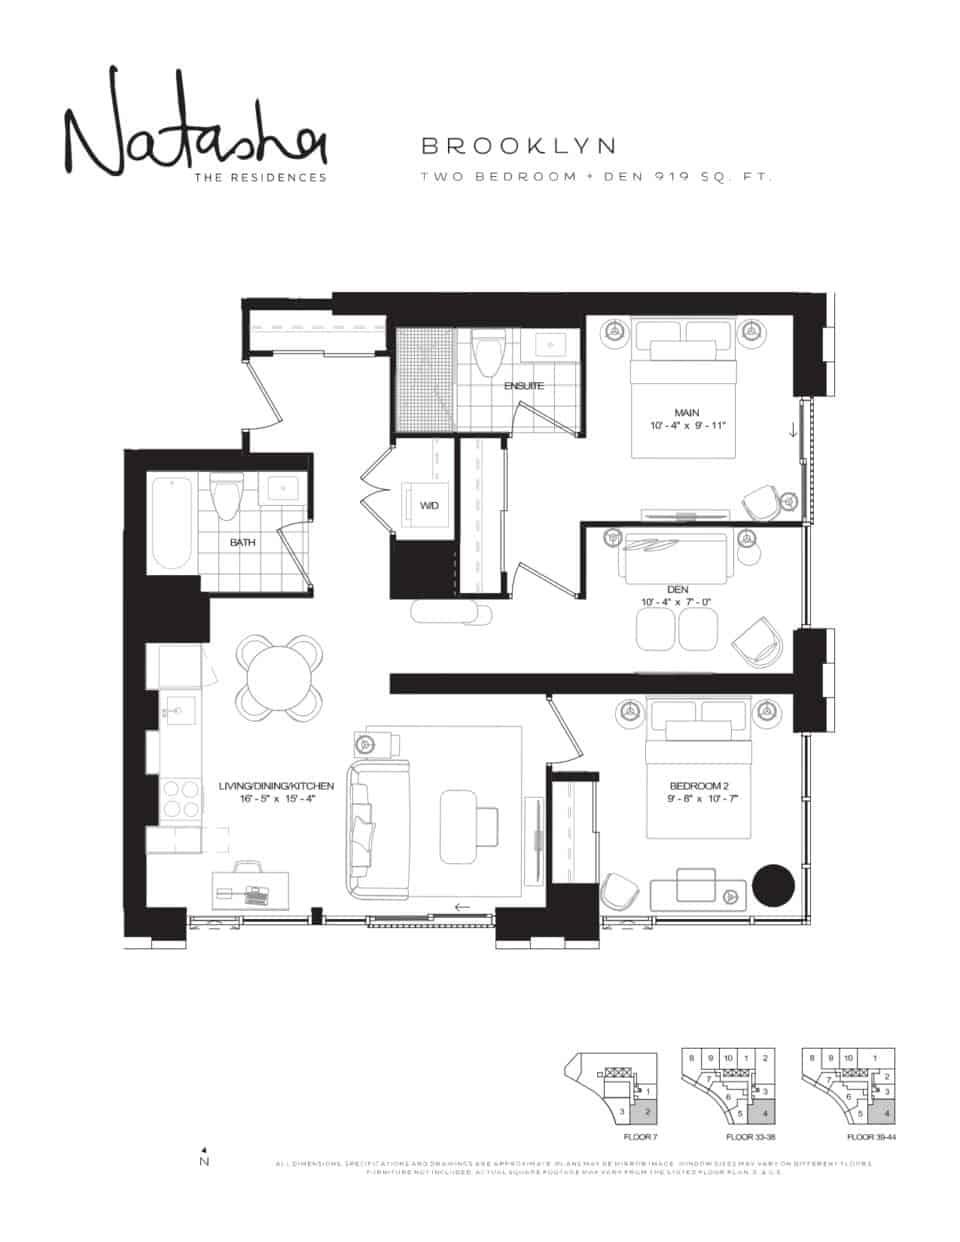 2021 09 02 11 02 01 natashatheresidences lanterradevelopments floorplans brooklyn